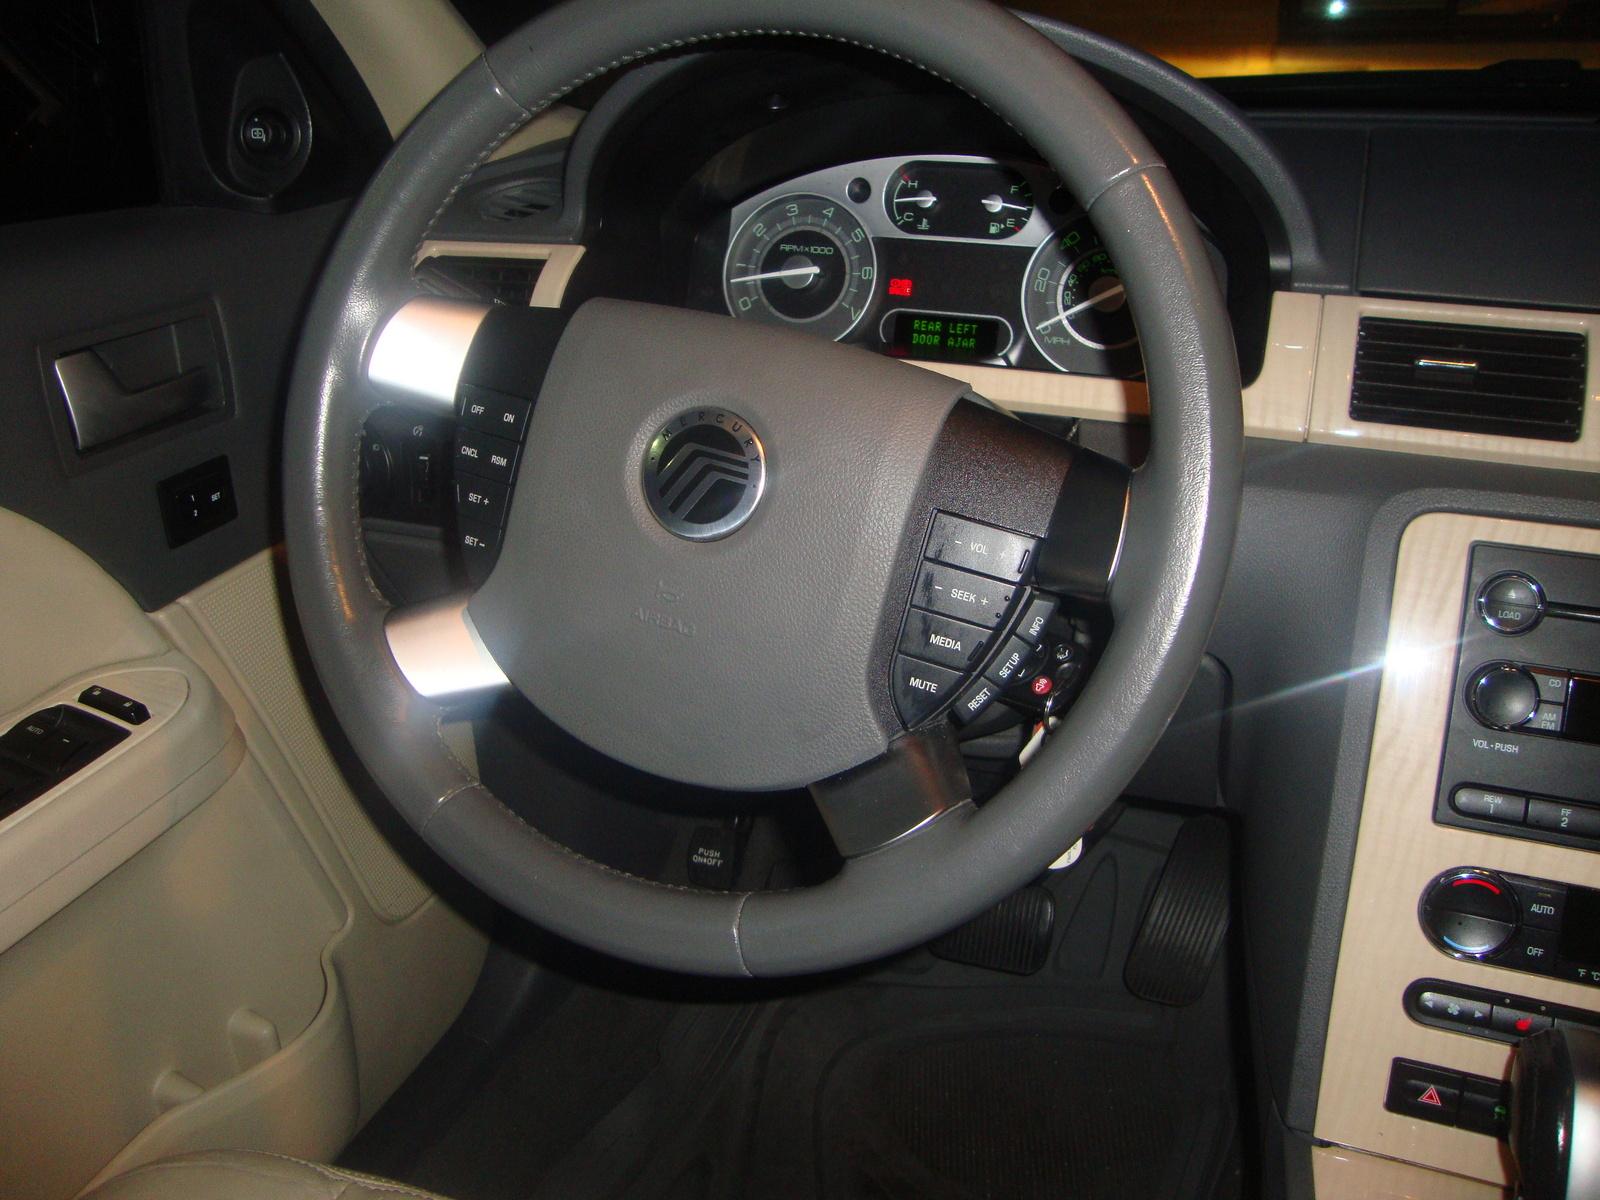 2008 Mercury Sable Interior